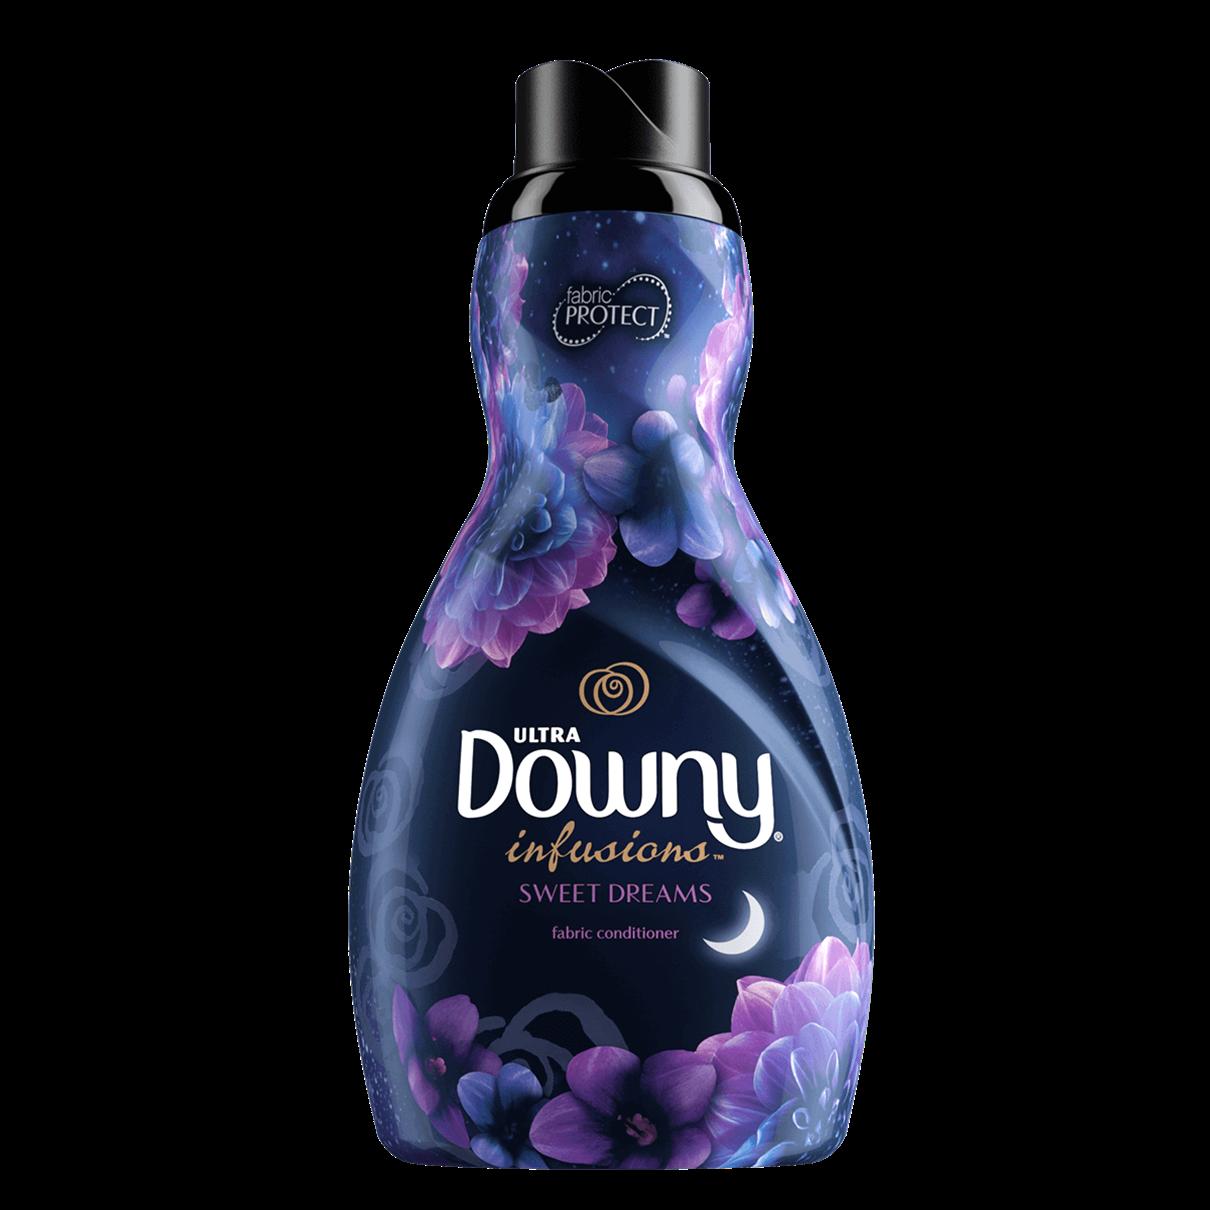 Downy Infusions Sweet Dreams Liquid Fabric Softener Downy Downy Infusions Downy Fabric Softener Downy